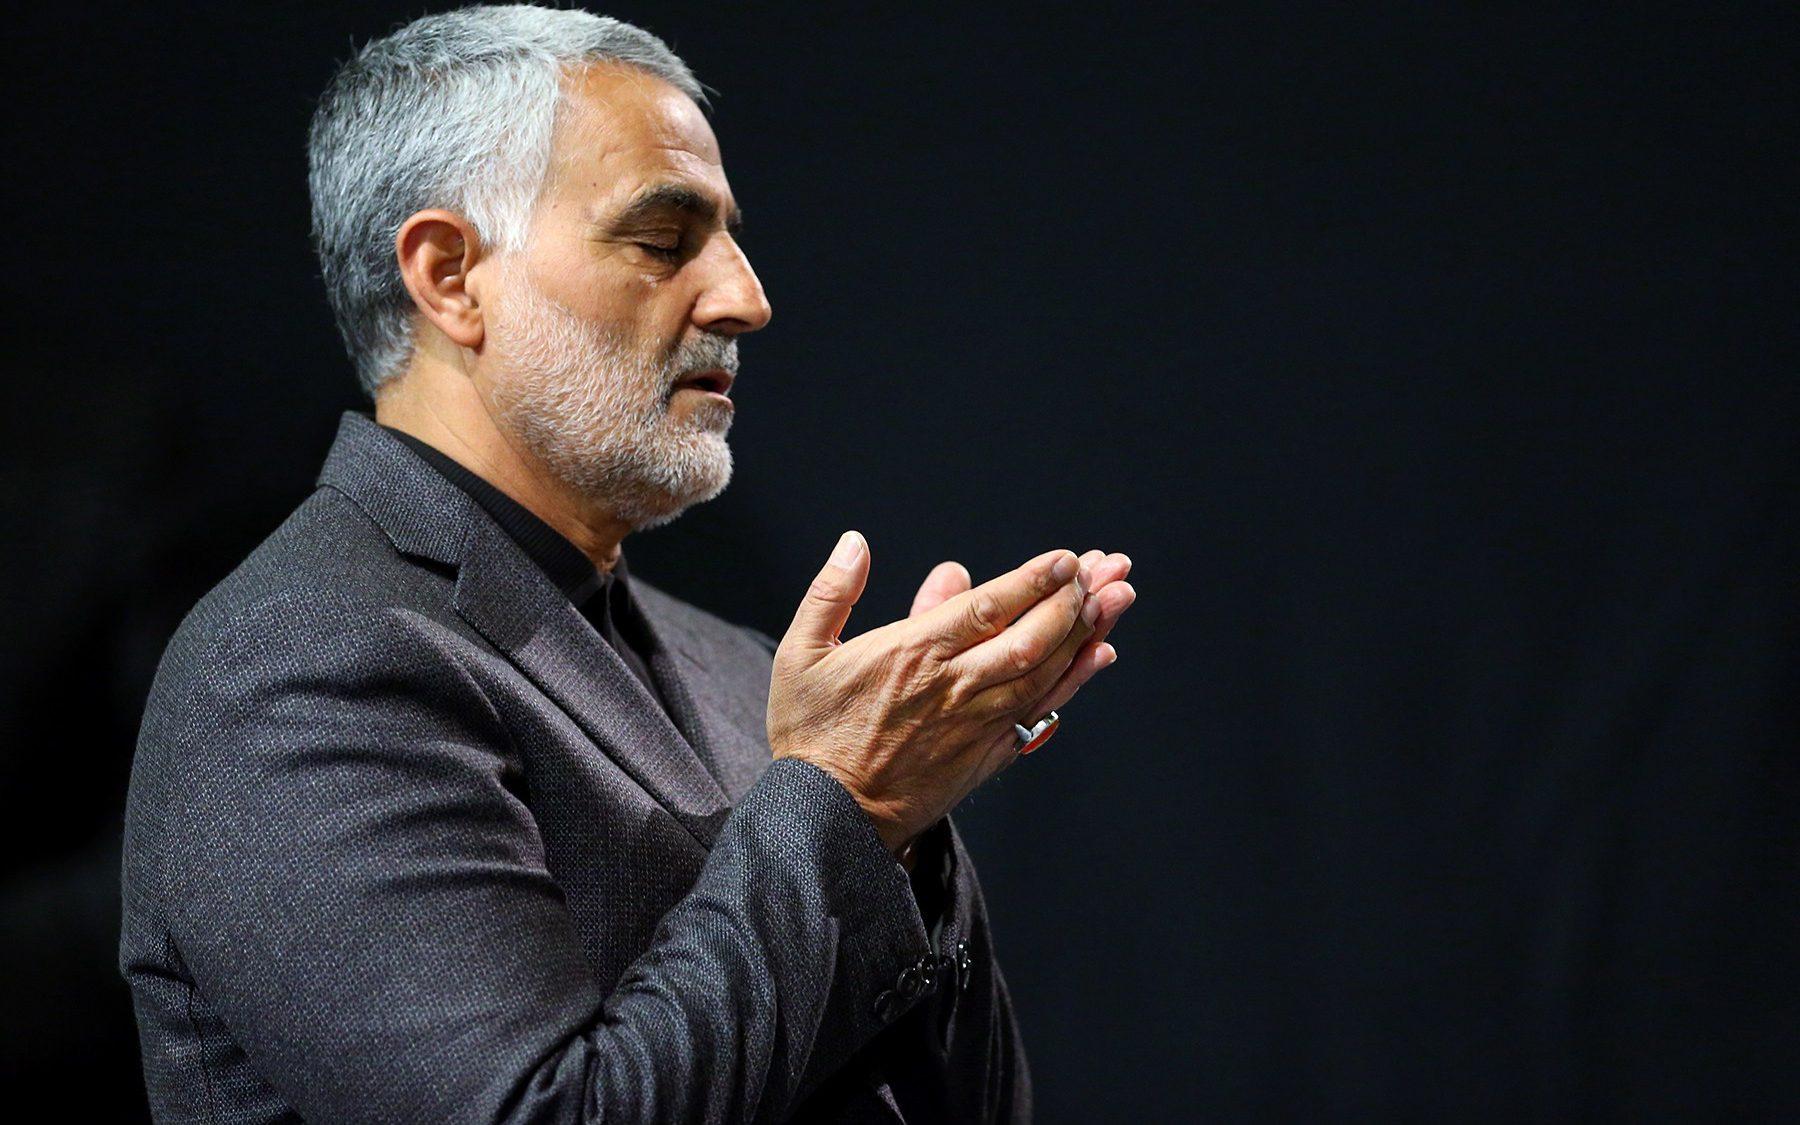 Qassim Soleimani: The shadowy Iranian general who undermined Washington for decades